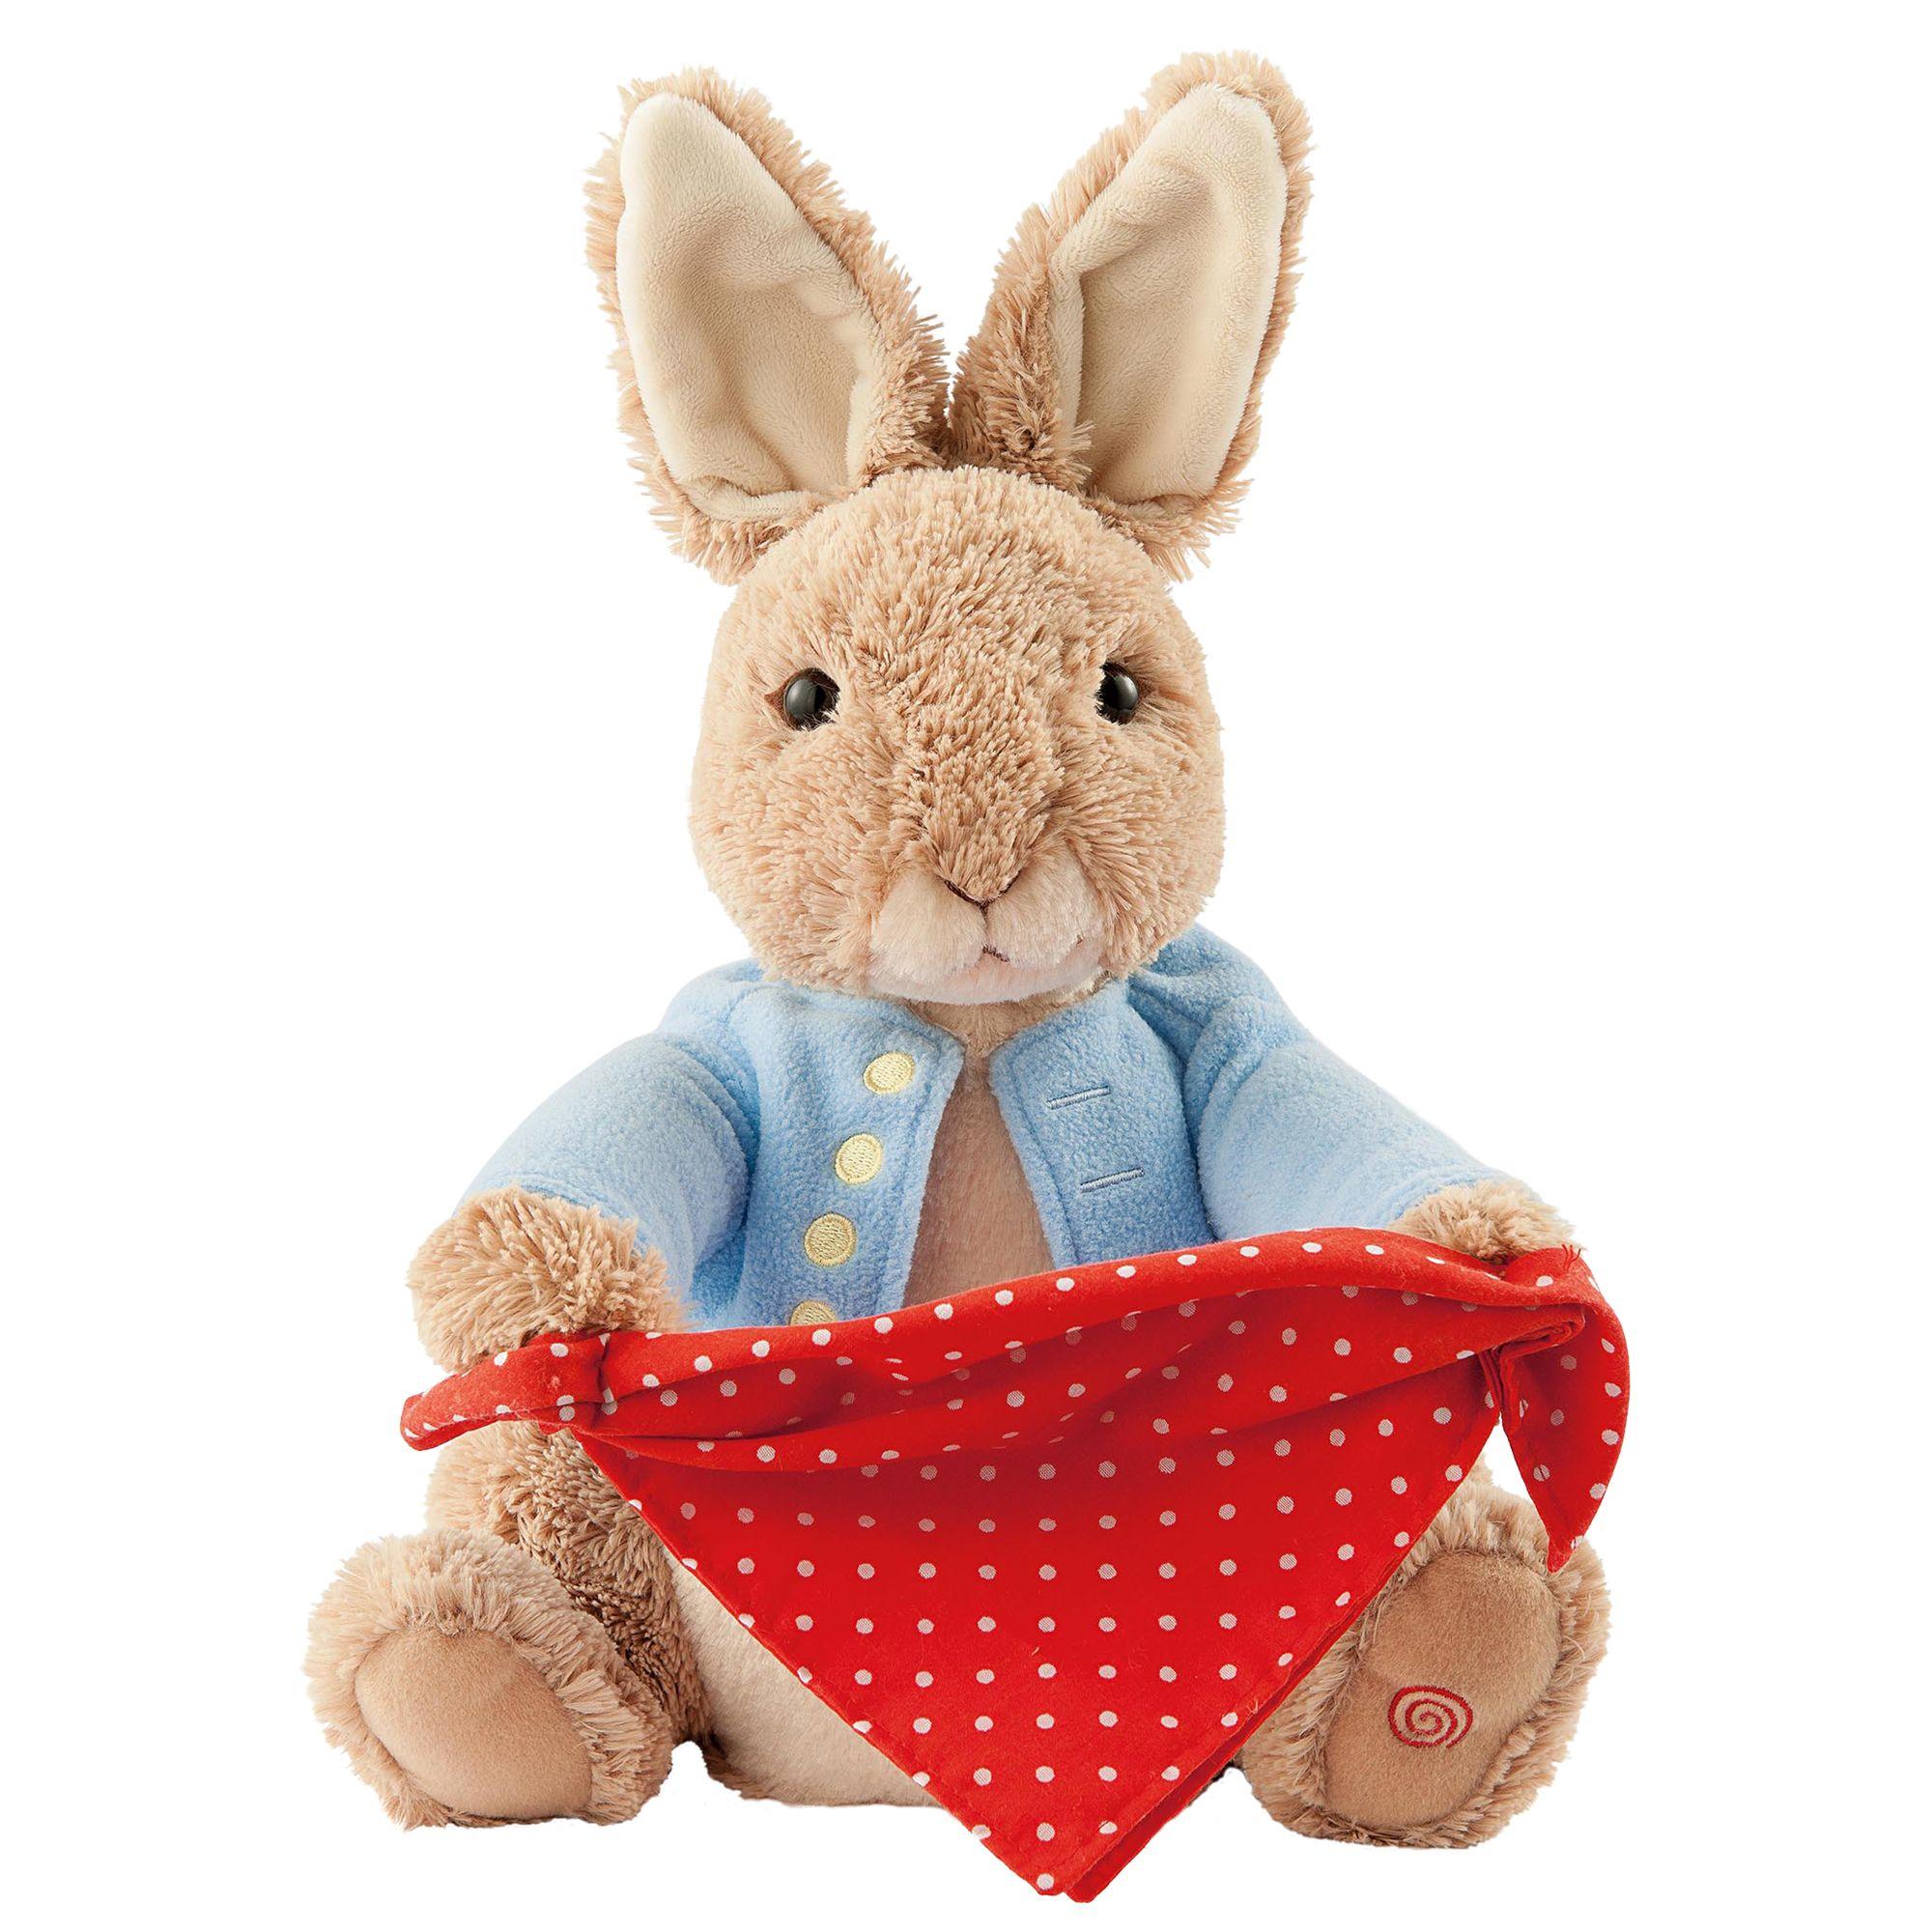 Beatrix Potter Beatrix Potter Peter Rabbit Peek-A-Boo Game Soft Toy